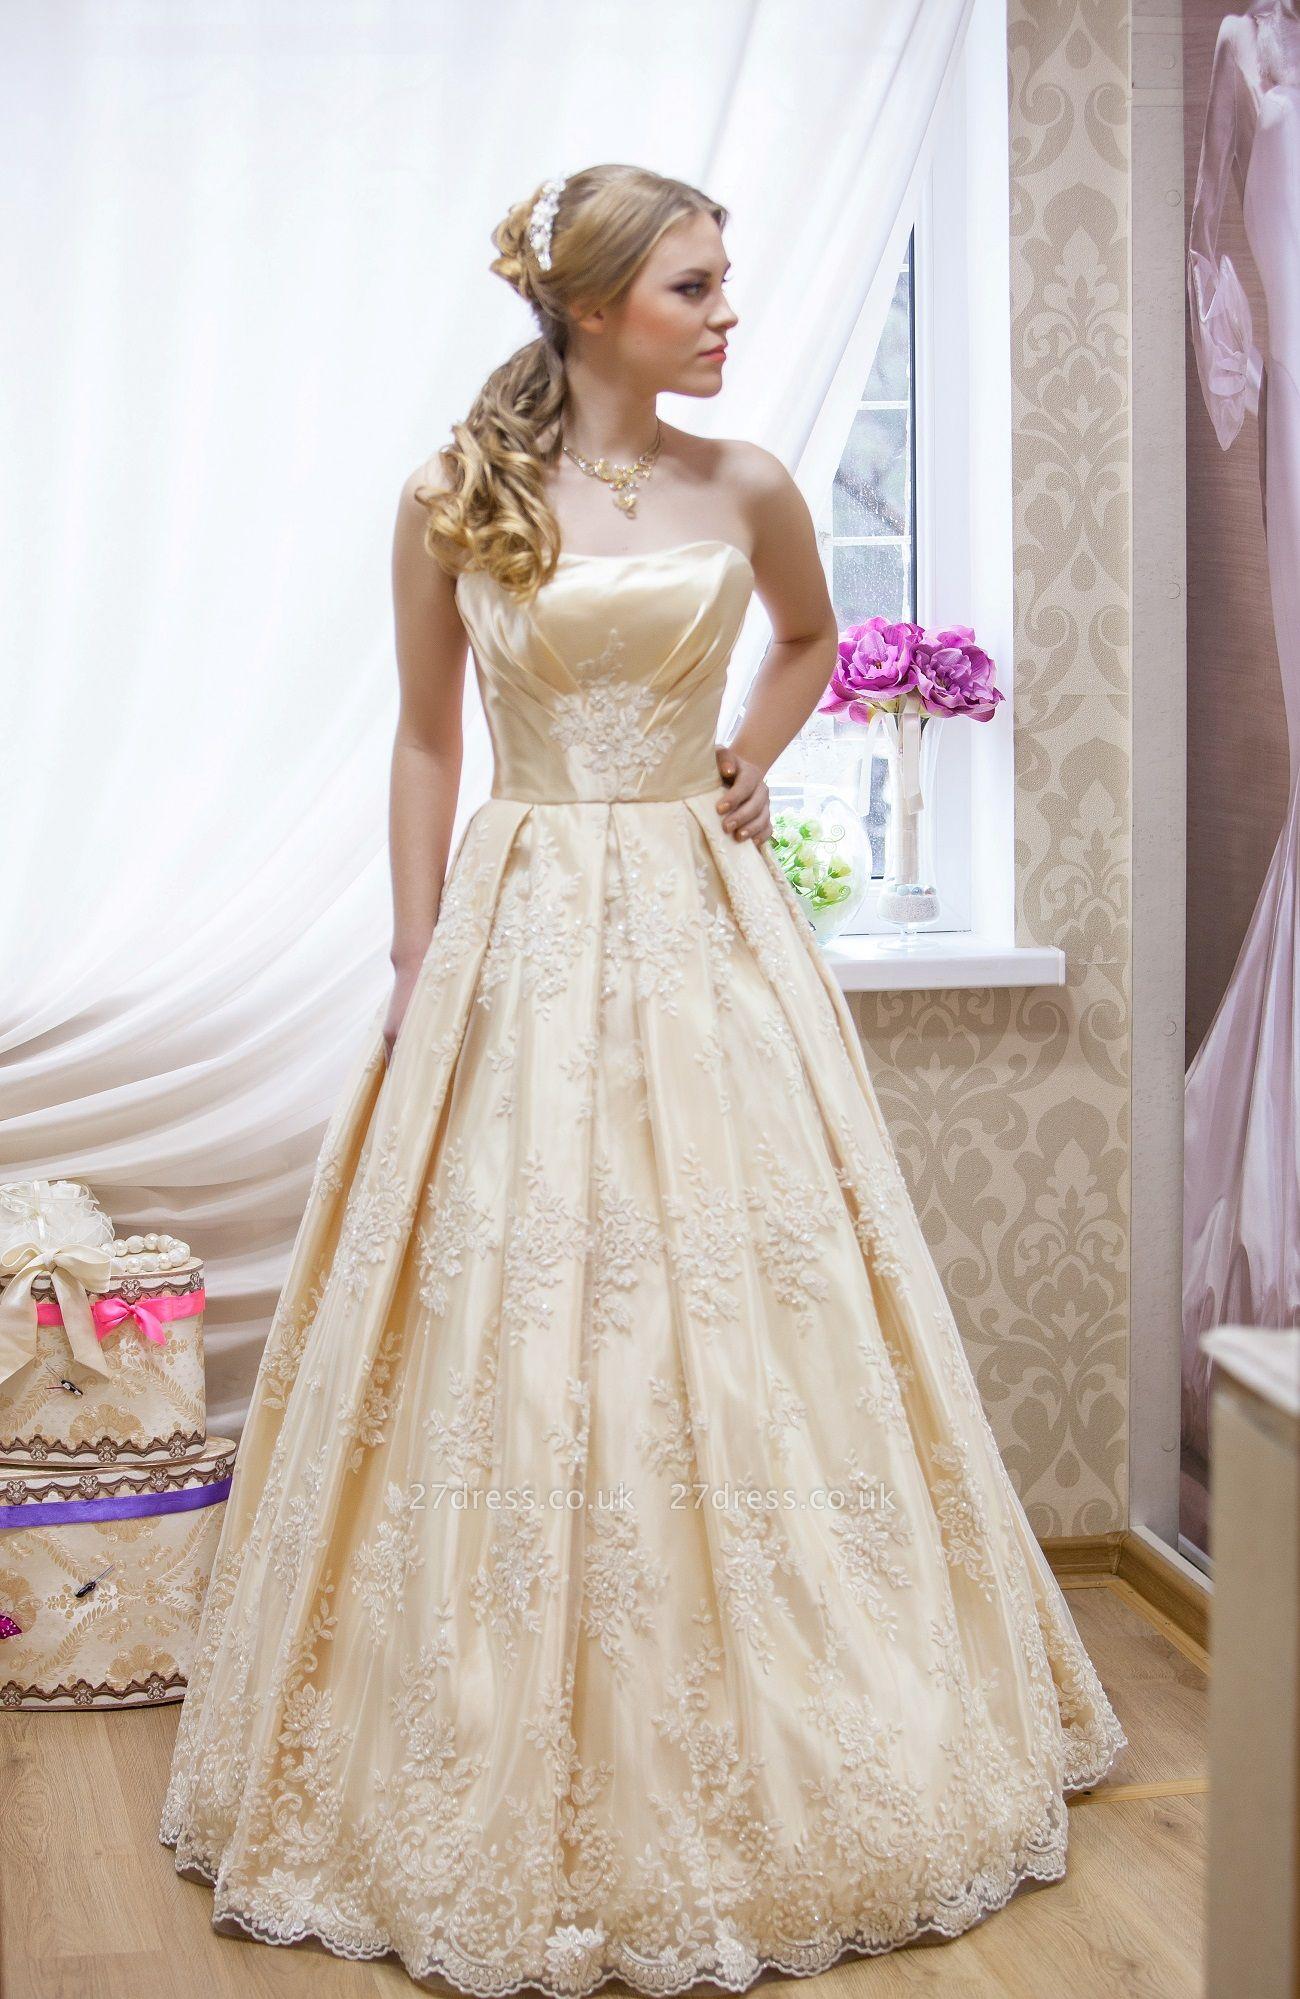 Elegant Strapless Sleeveless Champagne Wedding Dress Floor-length With Appliques